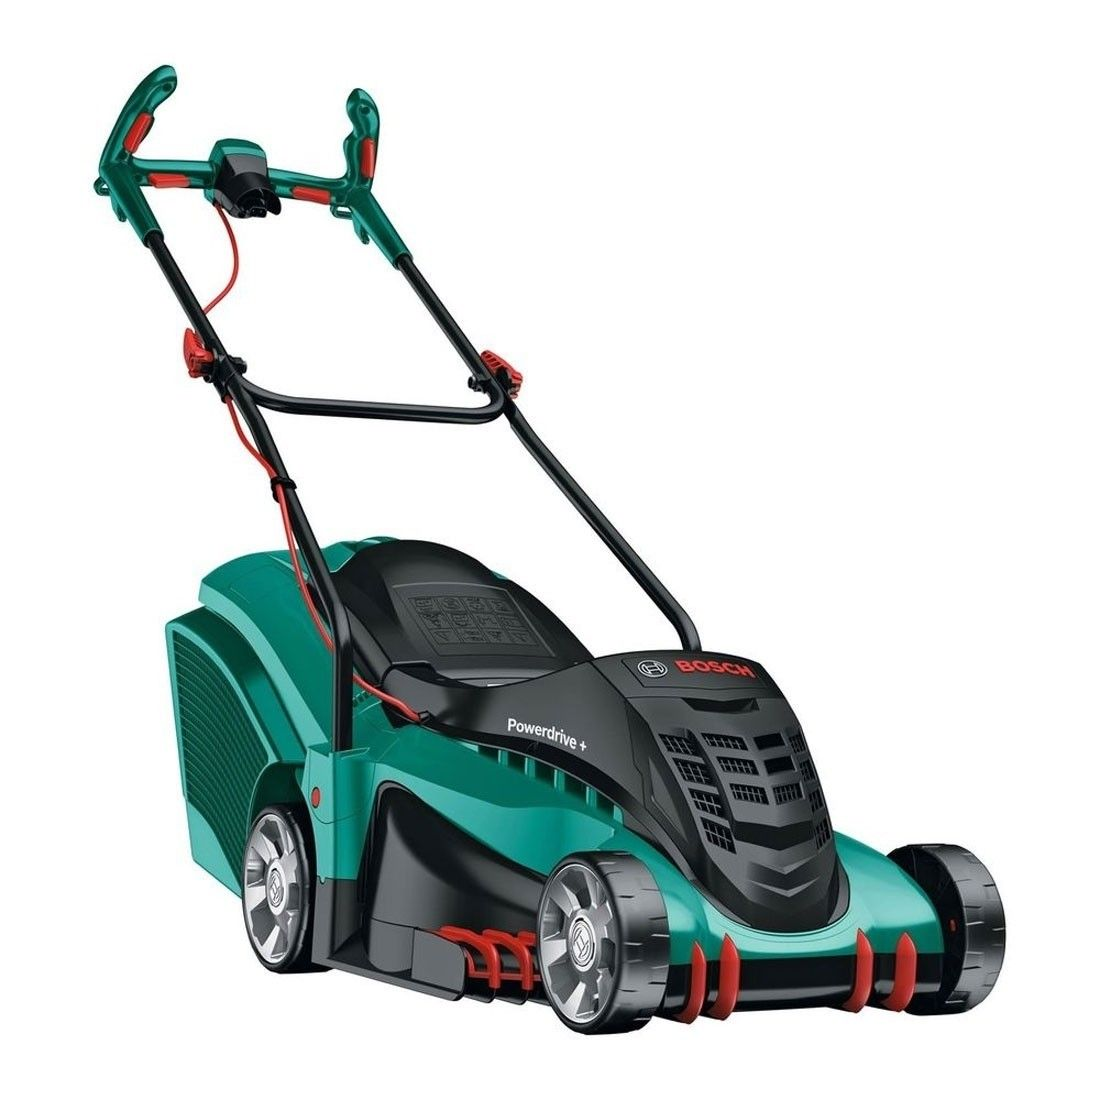 Bosch Rotak 37 Li Ergoflex Cordless Hand Propelled Electric Lawnmower Best Lawn Mower Cordless Lawn Mower Lawn Mower